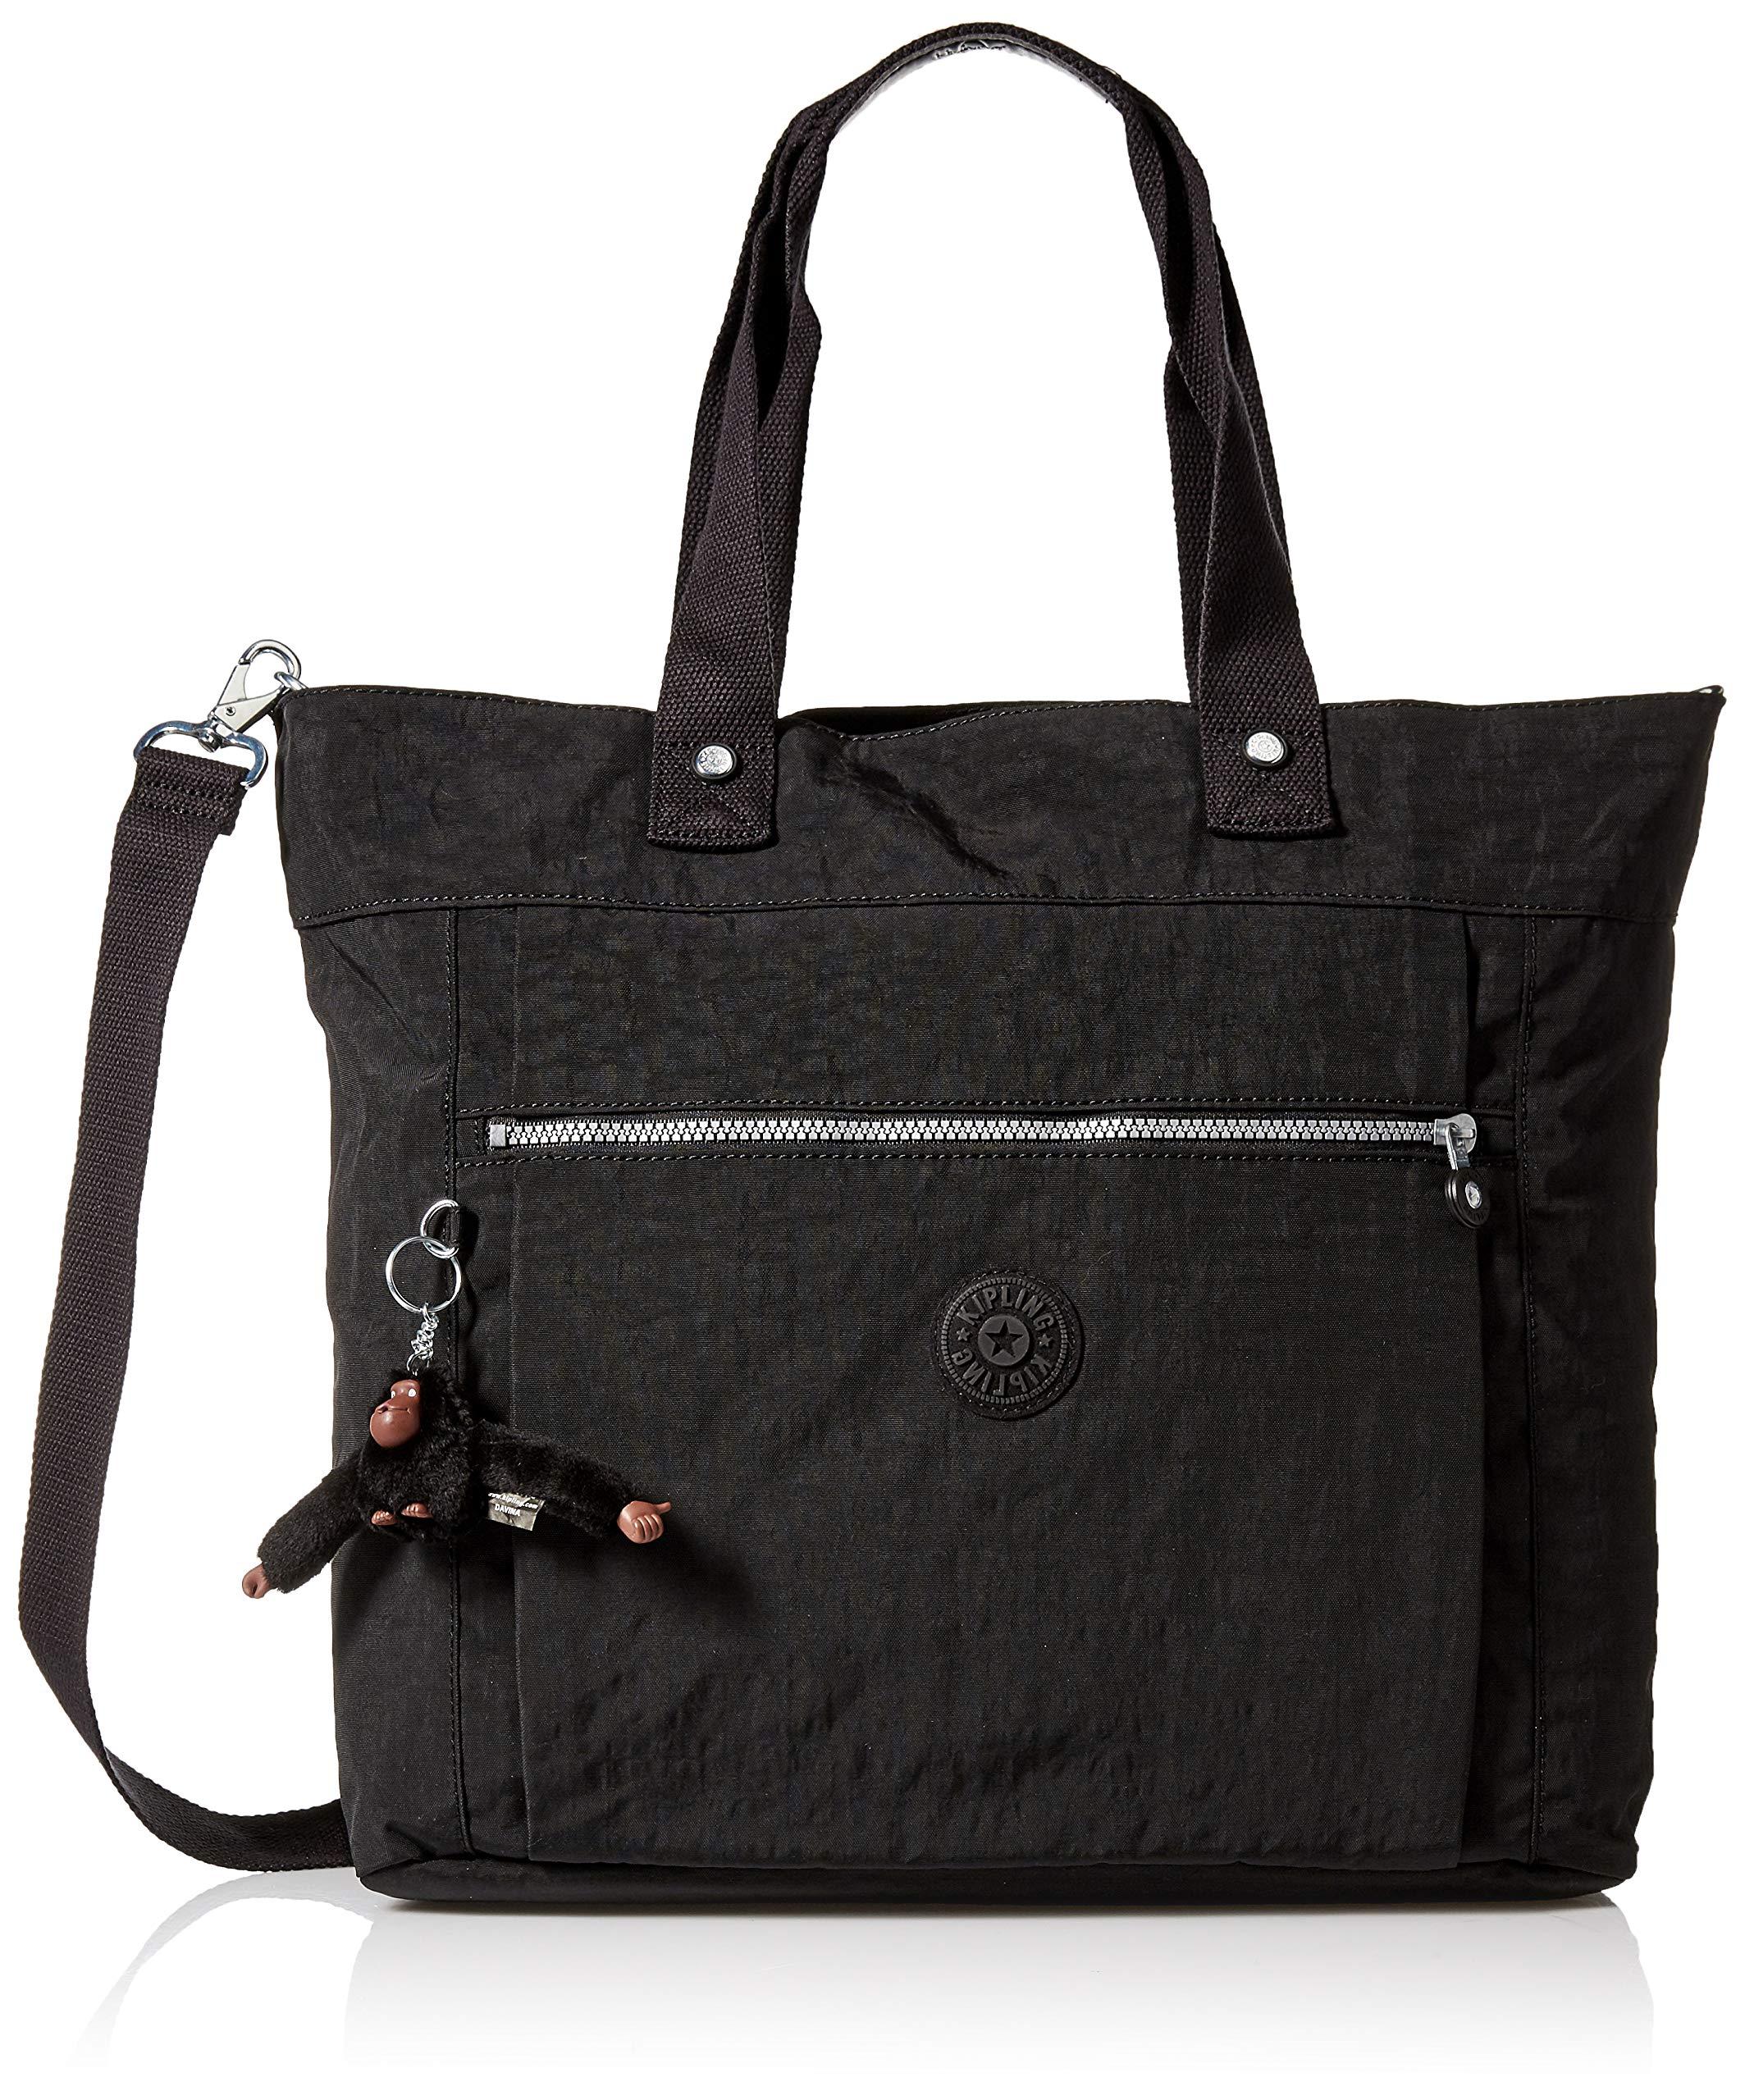 Kipling Lizzie Laptop Tote Bag, Removable, Adjustable Crossbody Strap, Zip Closure, Black